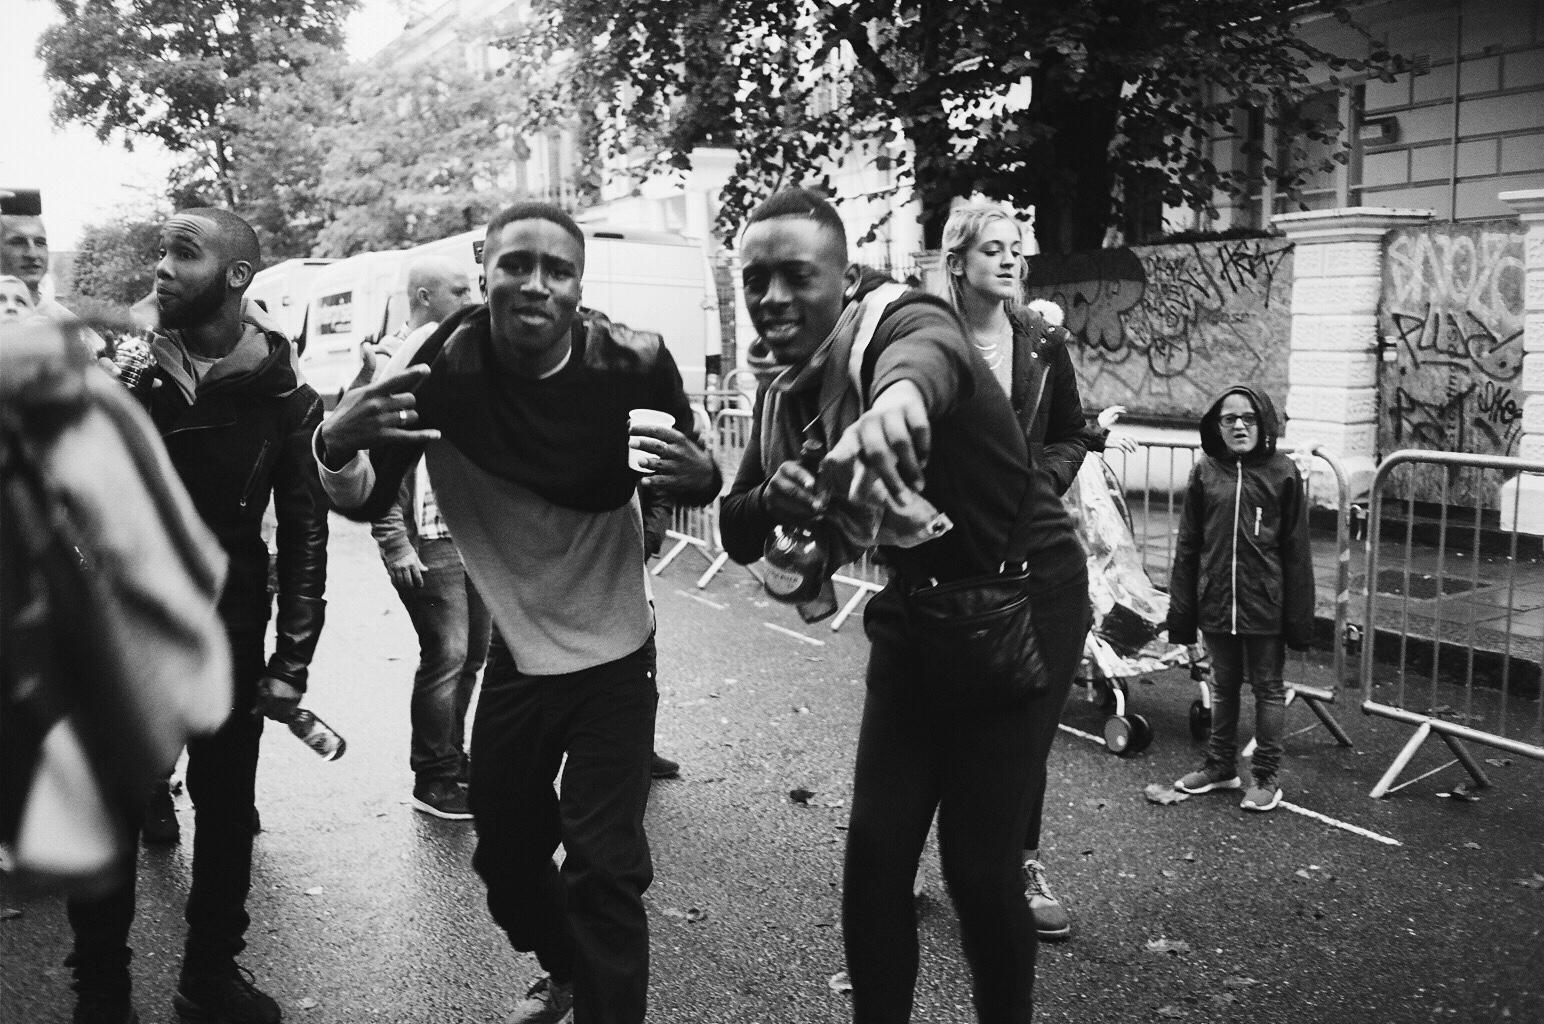 BW carnival boys.jpg